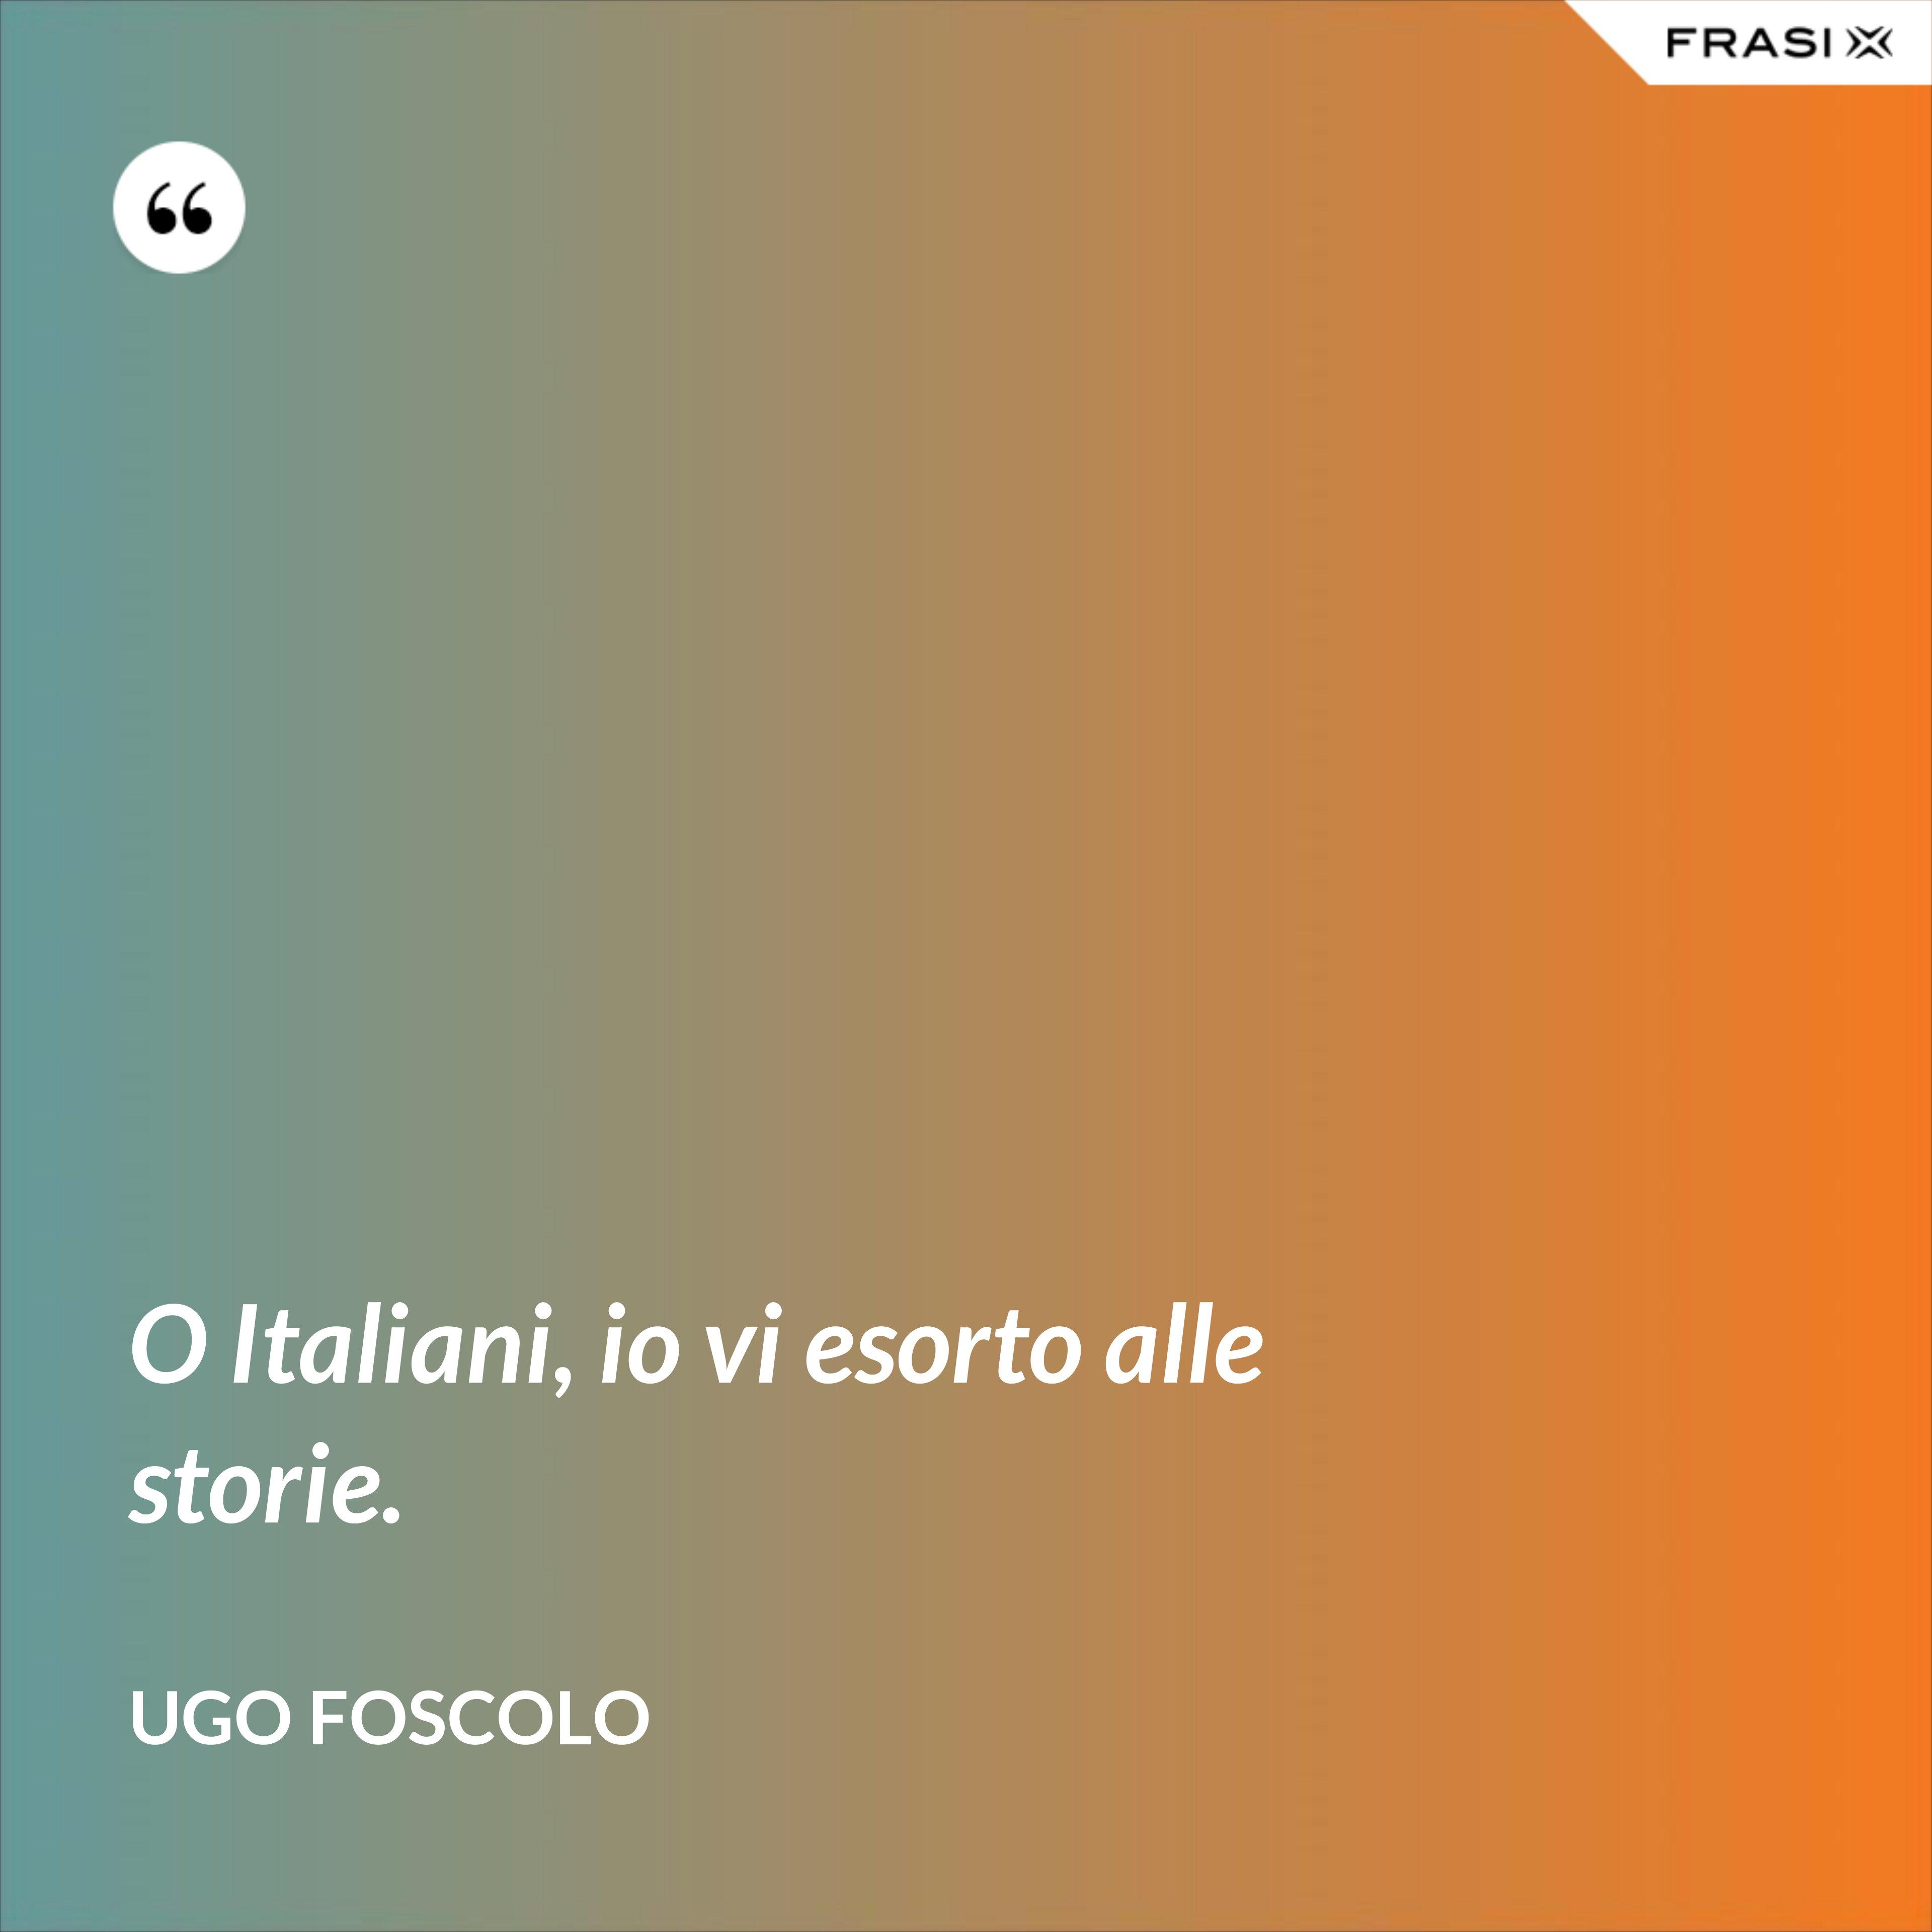 O Italiani, io vi esorto alle storie. - Ugo Foscolo